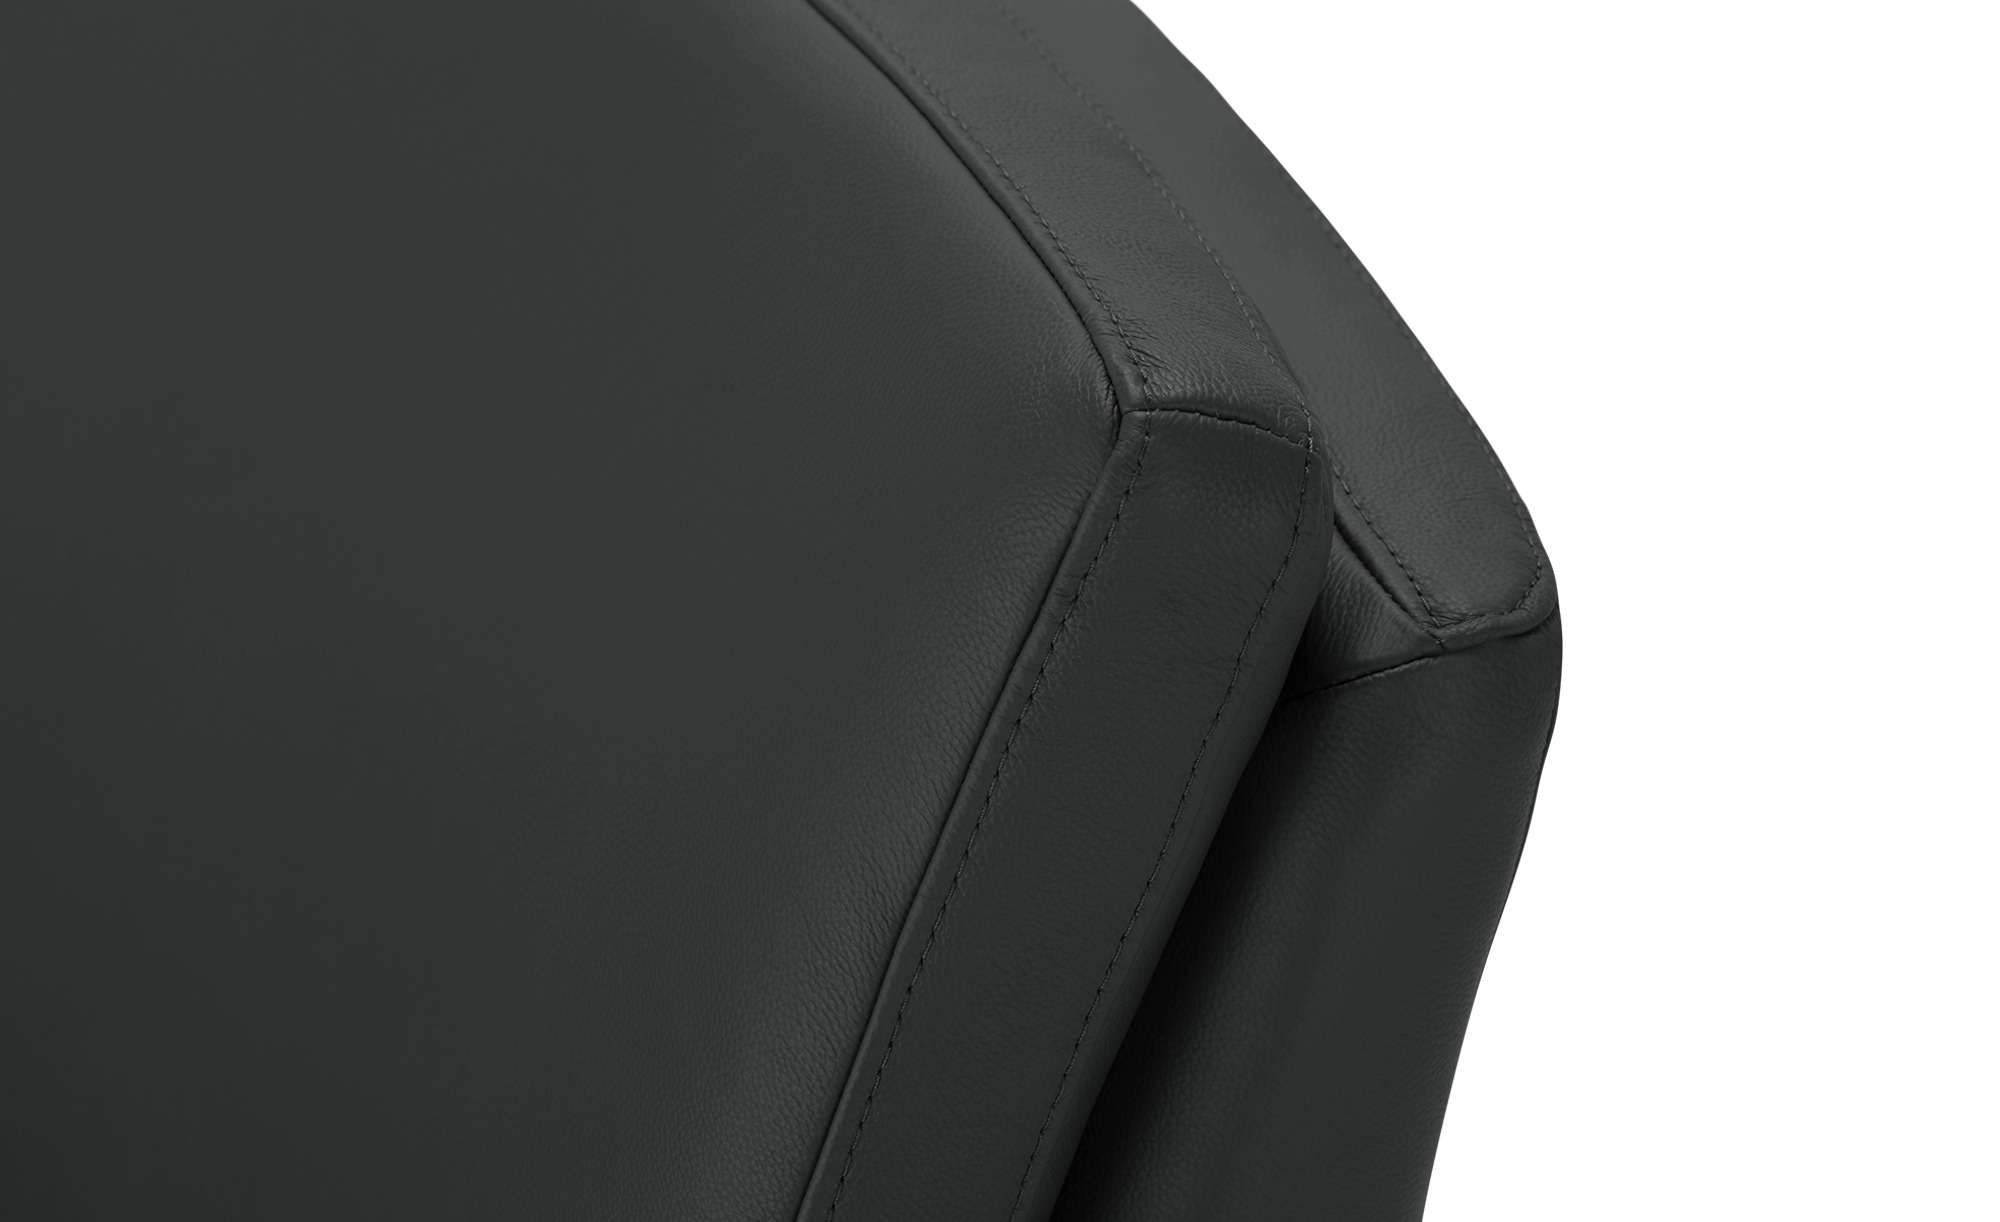 Wohnwert Sessel  Alexa ¦ schwarz ¦ Maße (cm): B: 84 H: 87 T: 84 Polstermöbel > Sessel > Ledersessel - Höffner